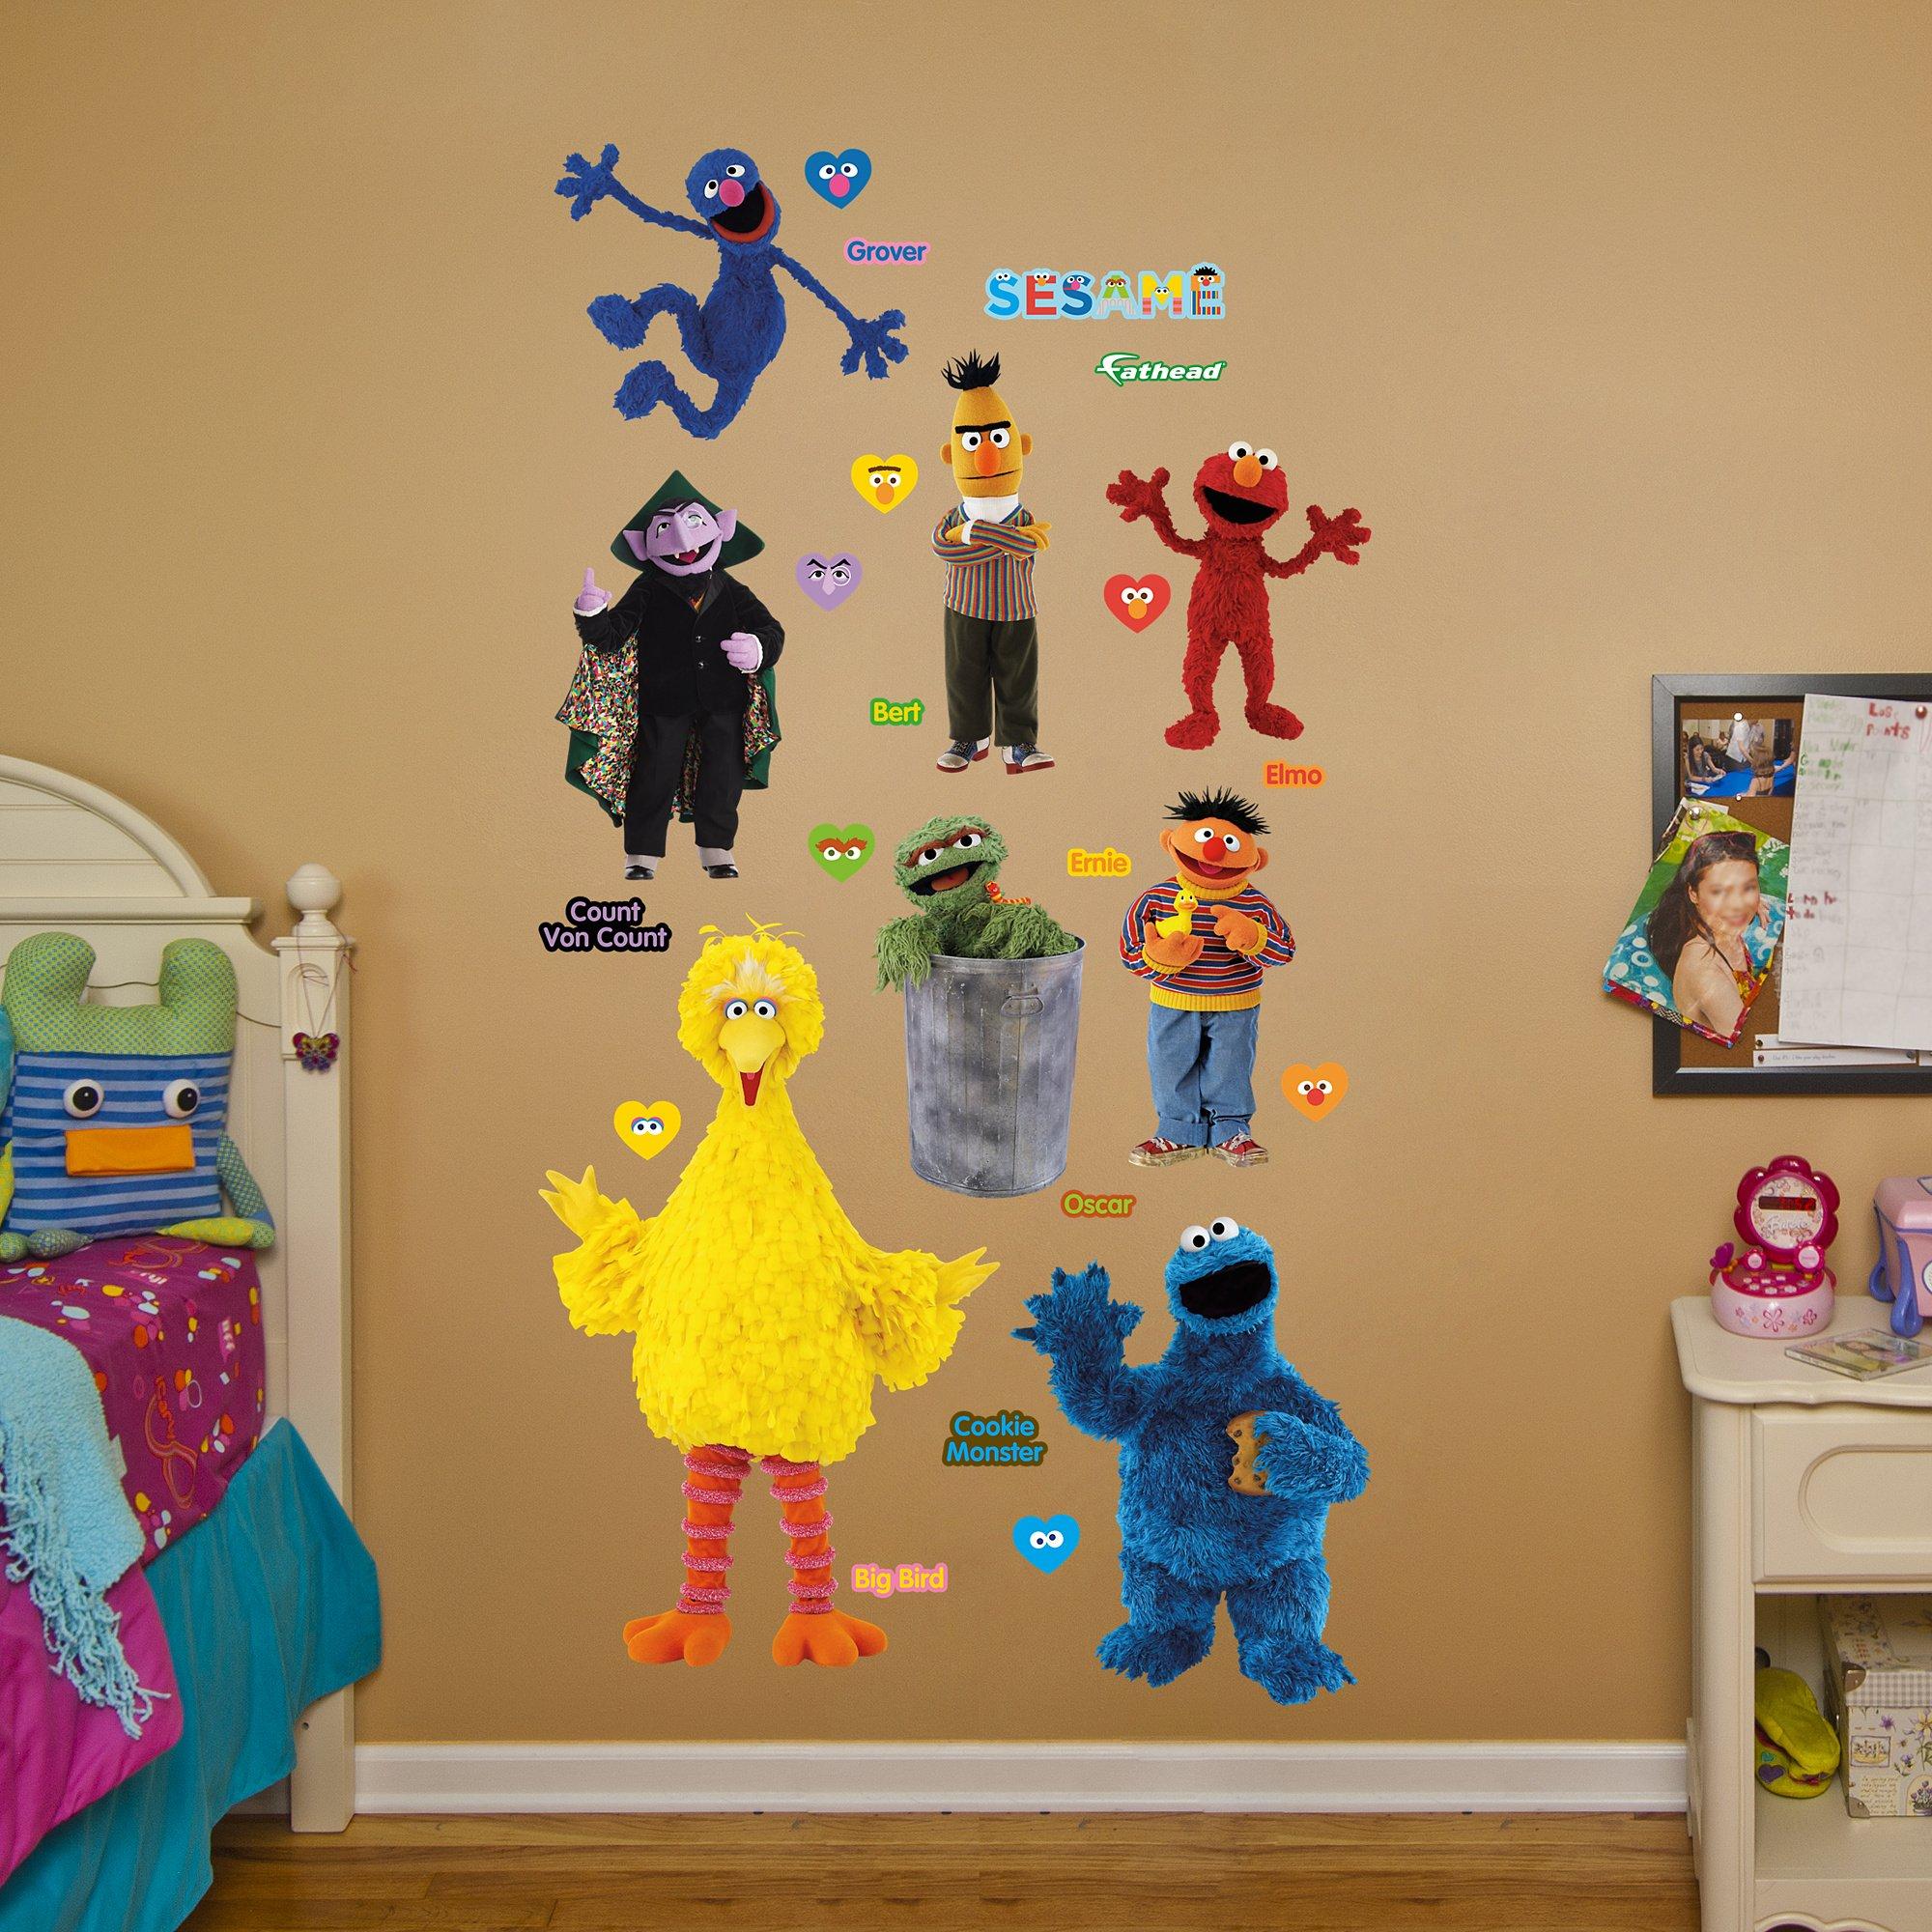 Sesame Street Wall Decals: Amazon.com